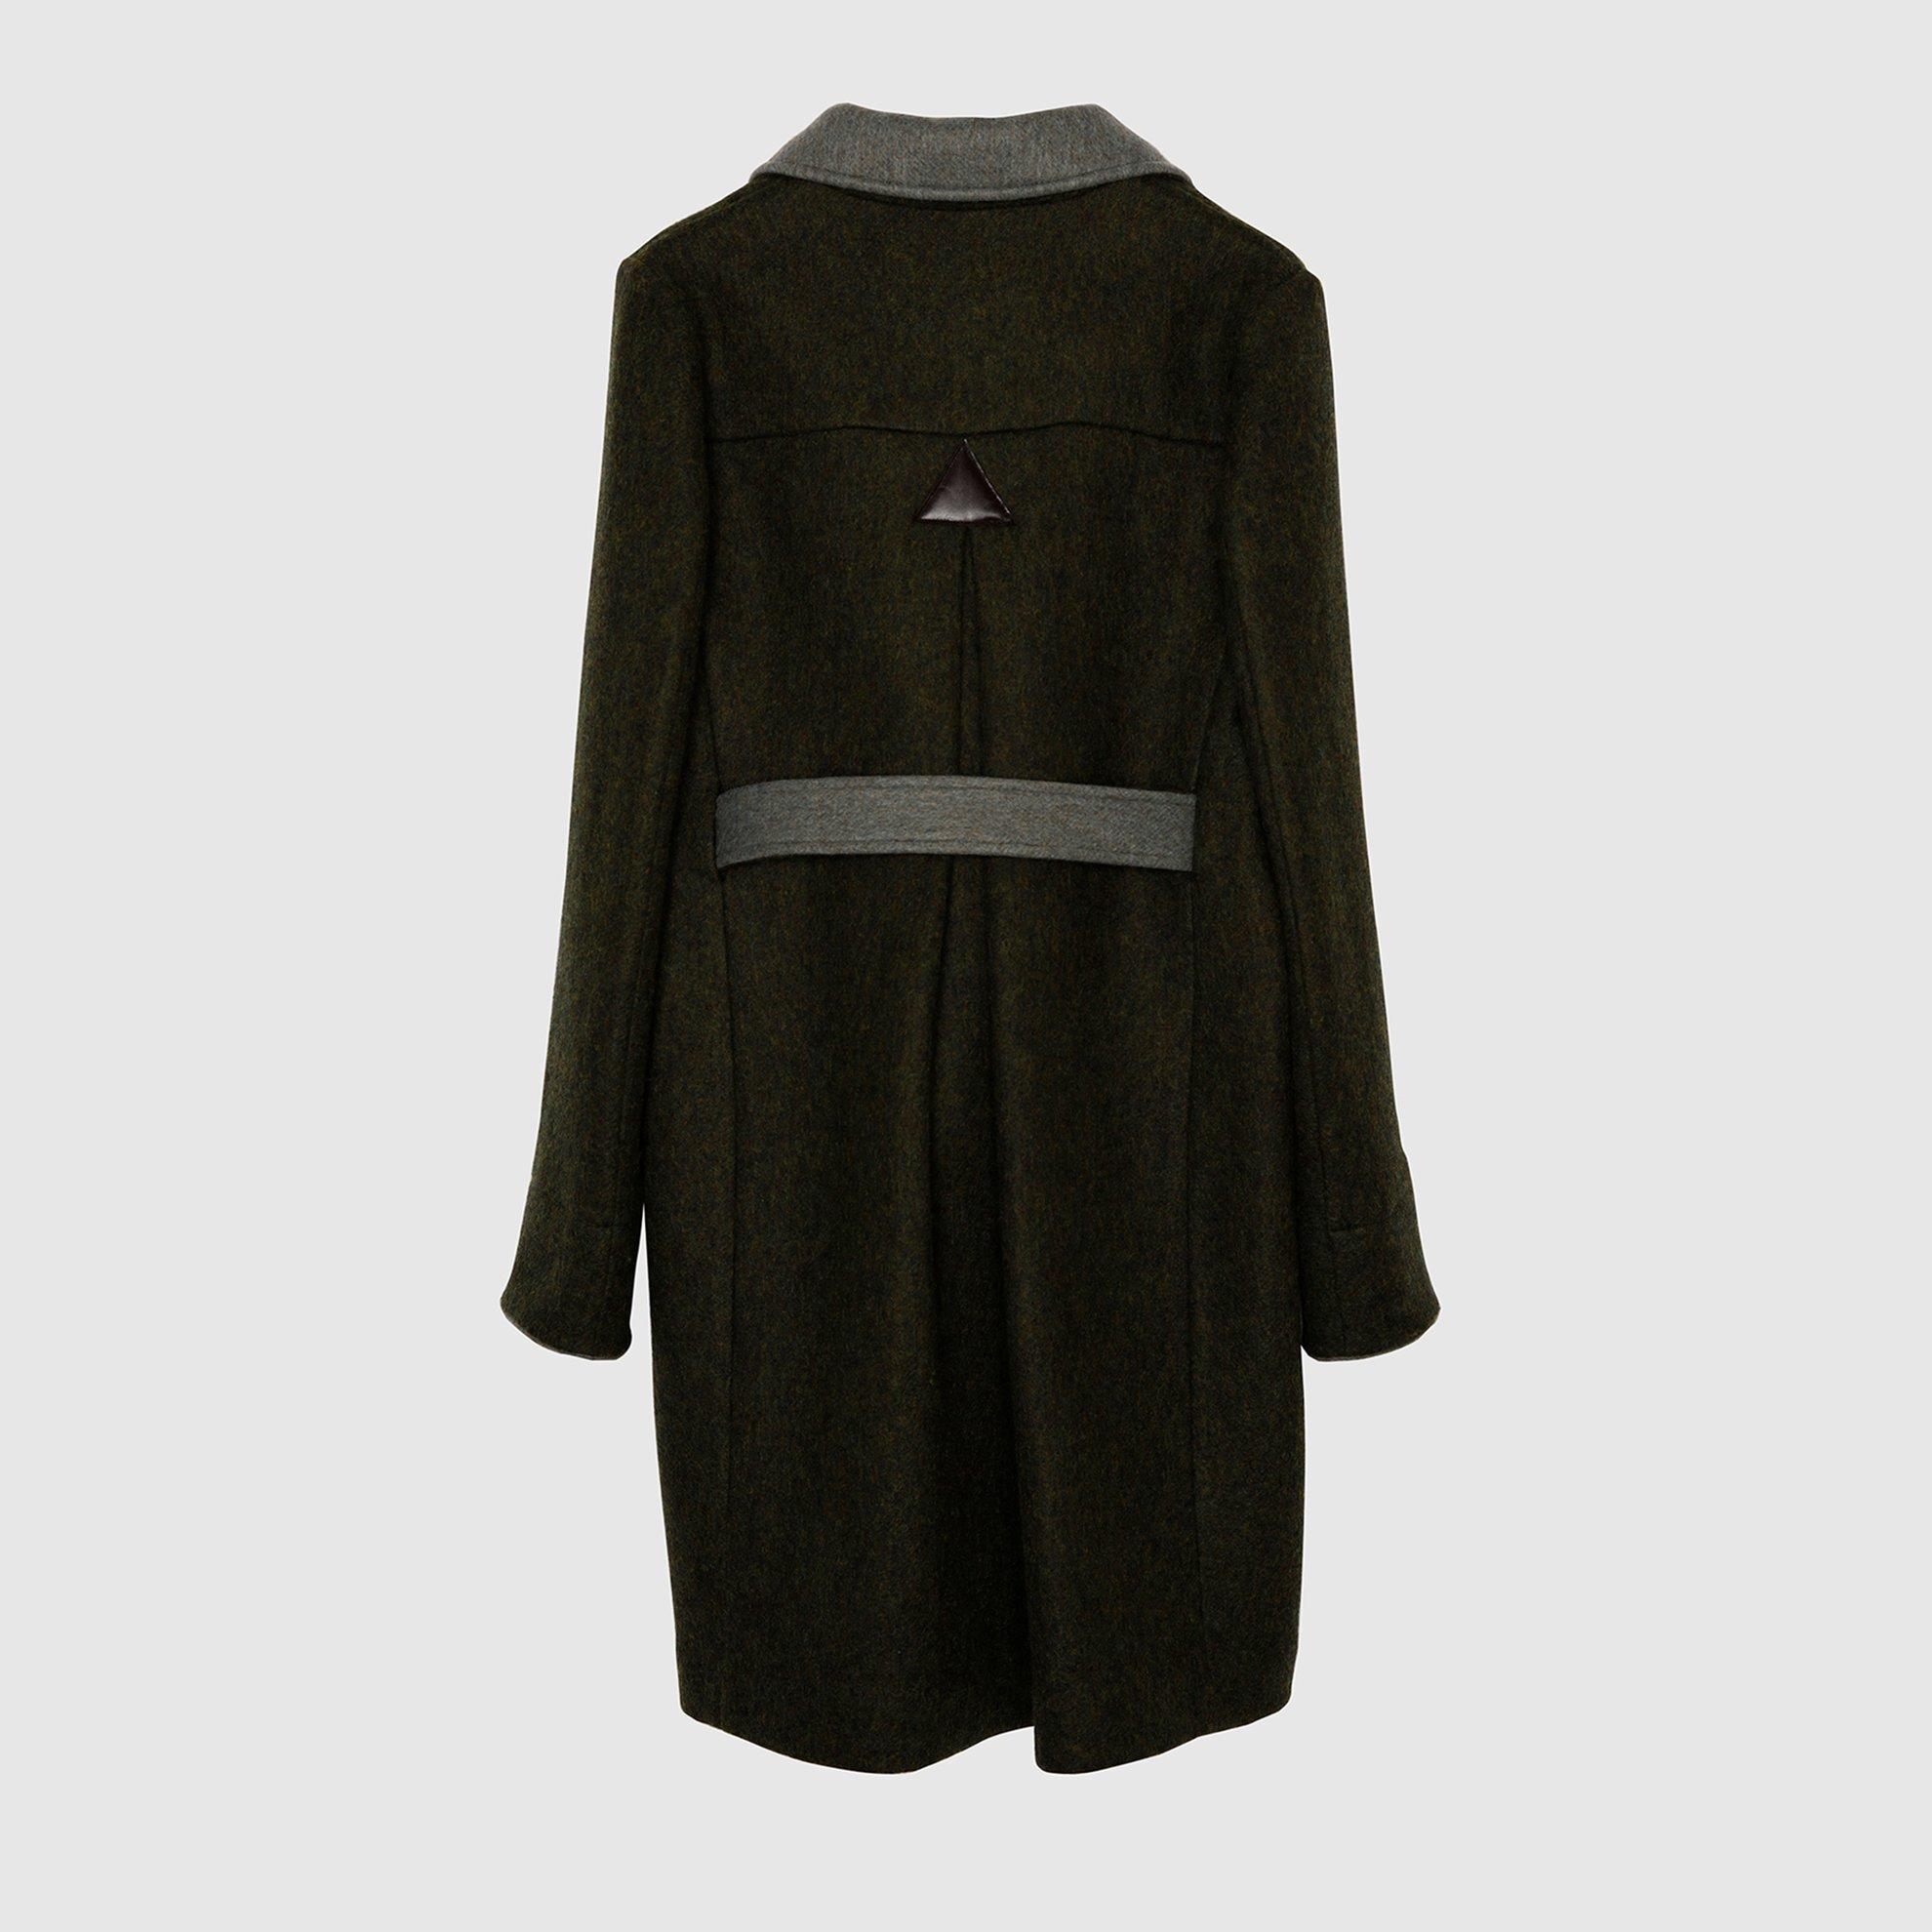 resm Kemer Detaylı Palto